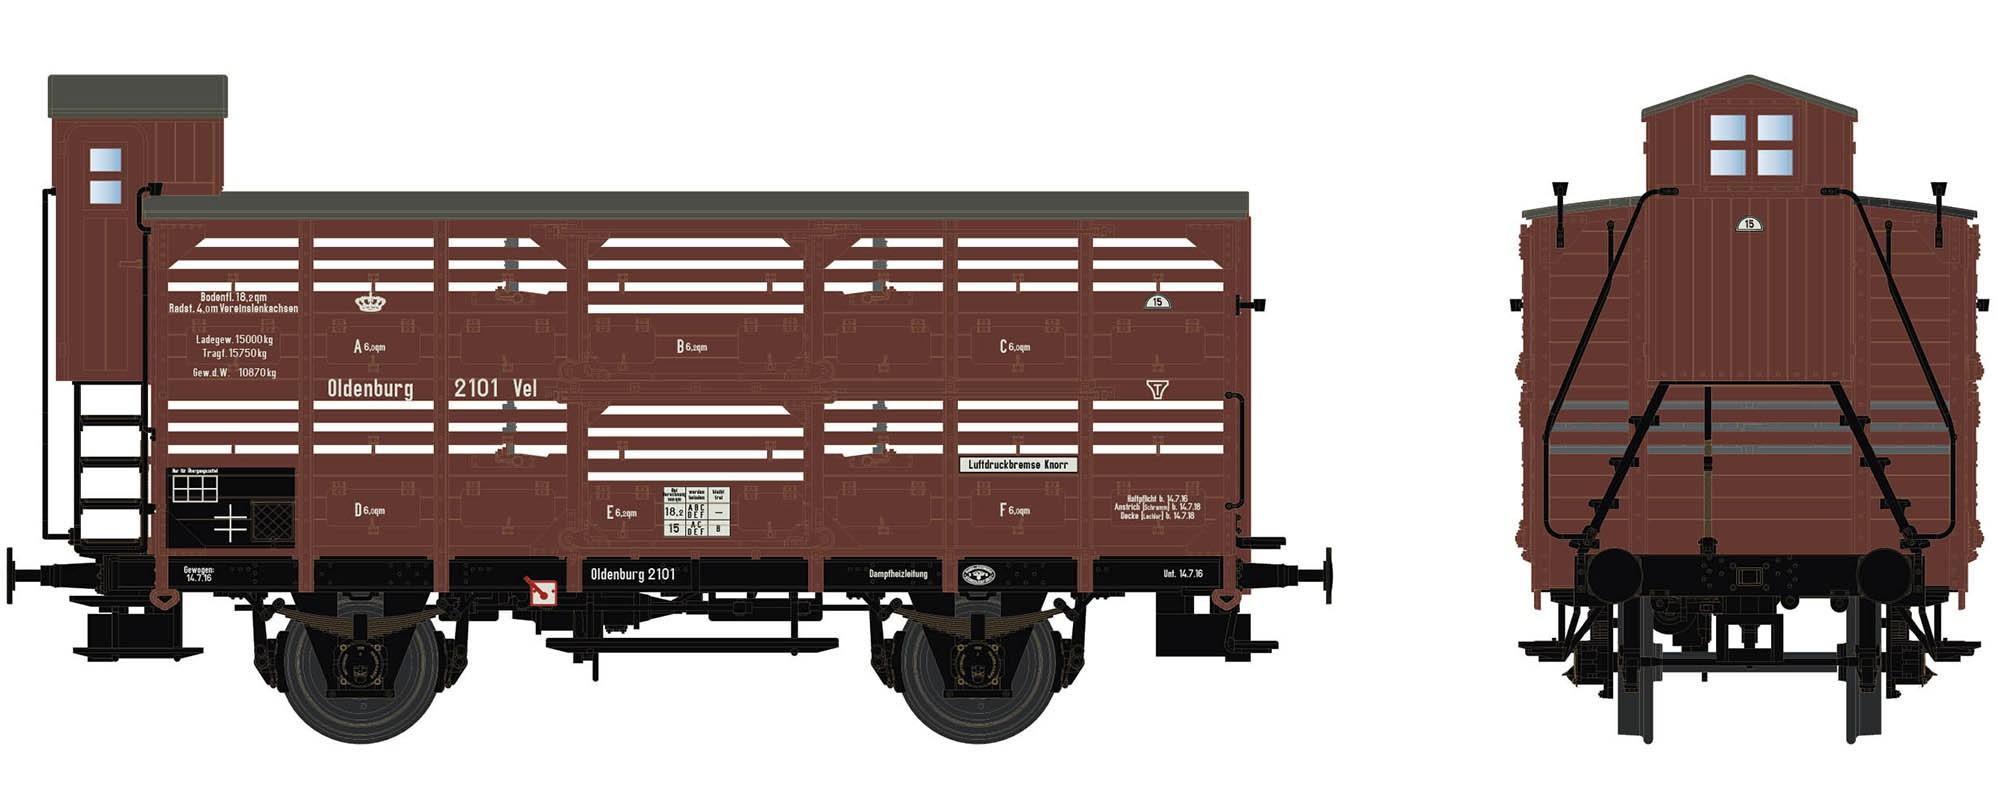 Wagenbausatz Verschlagwagen Vh14, G.O.E., Epoche I